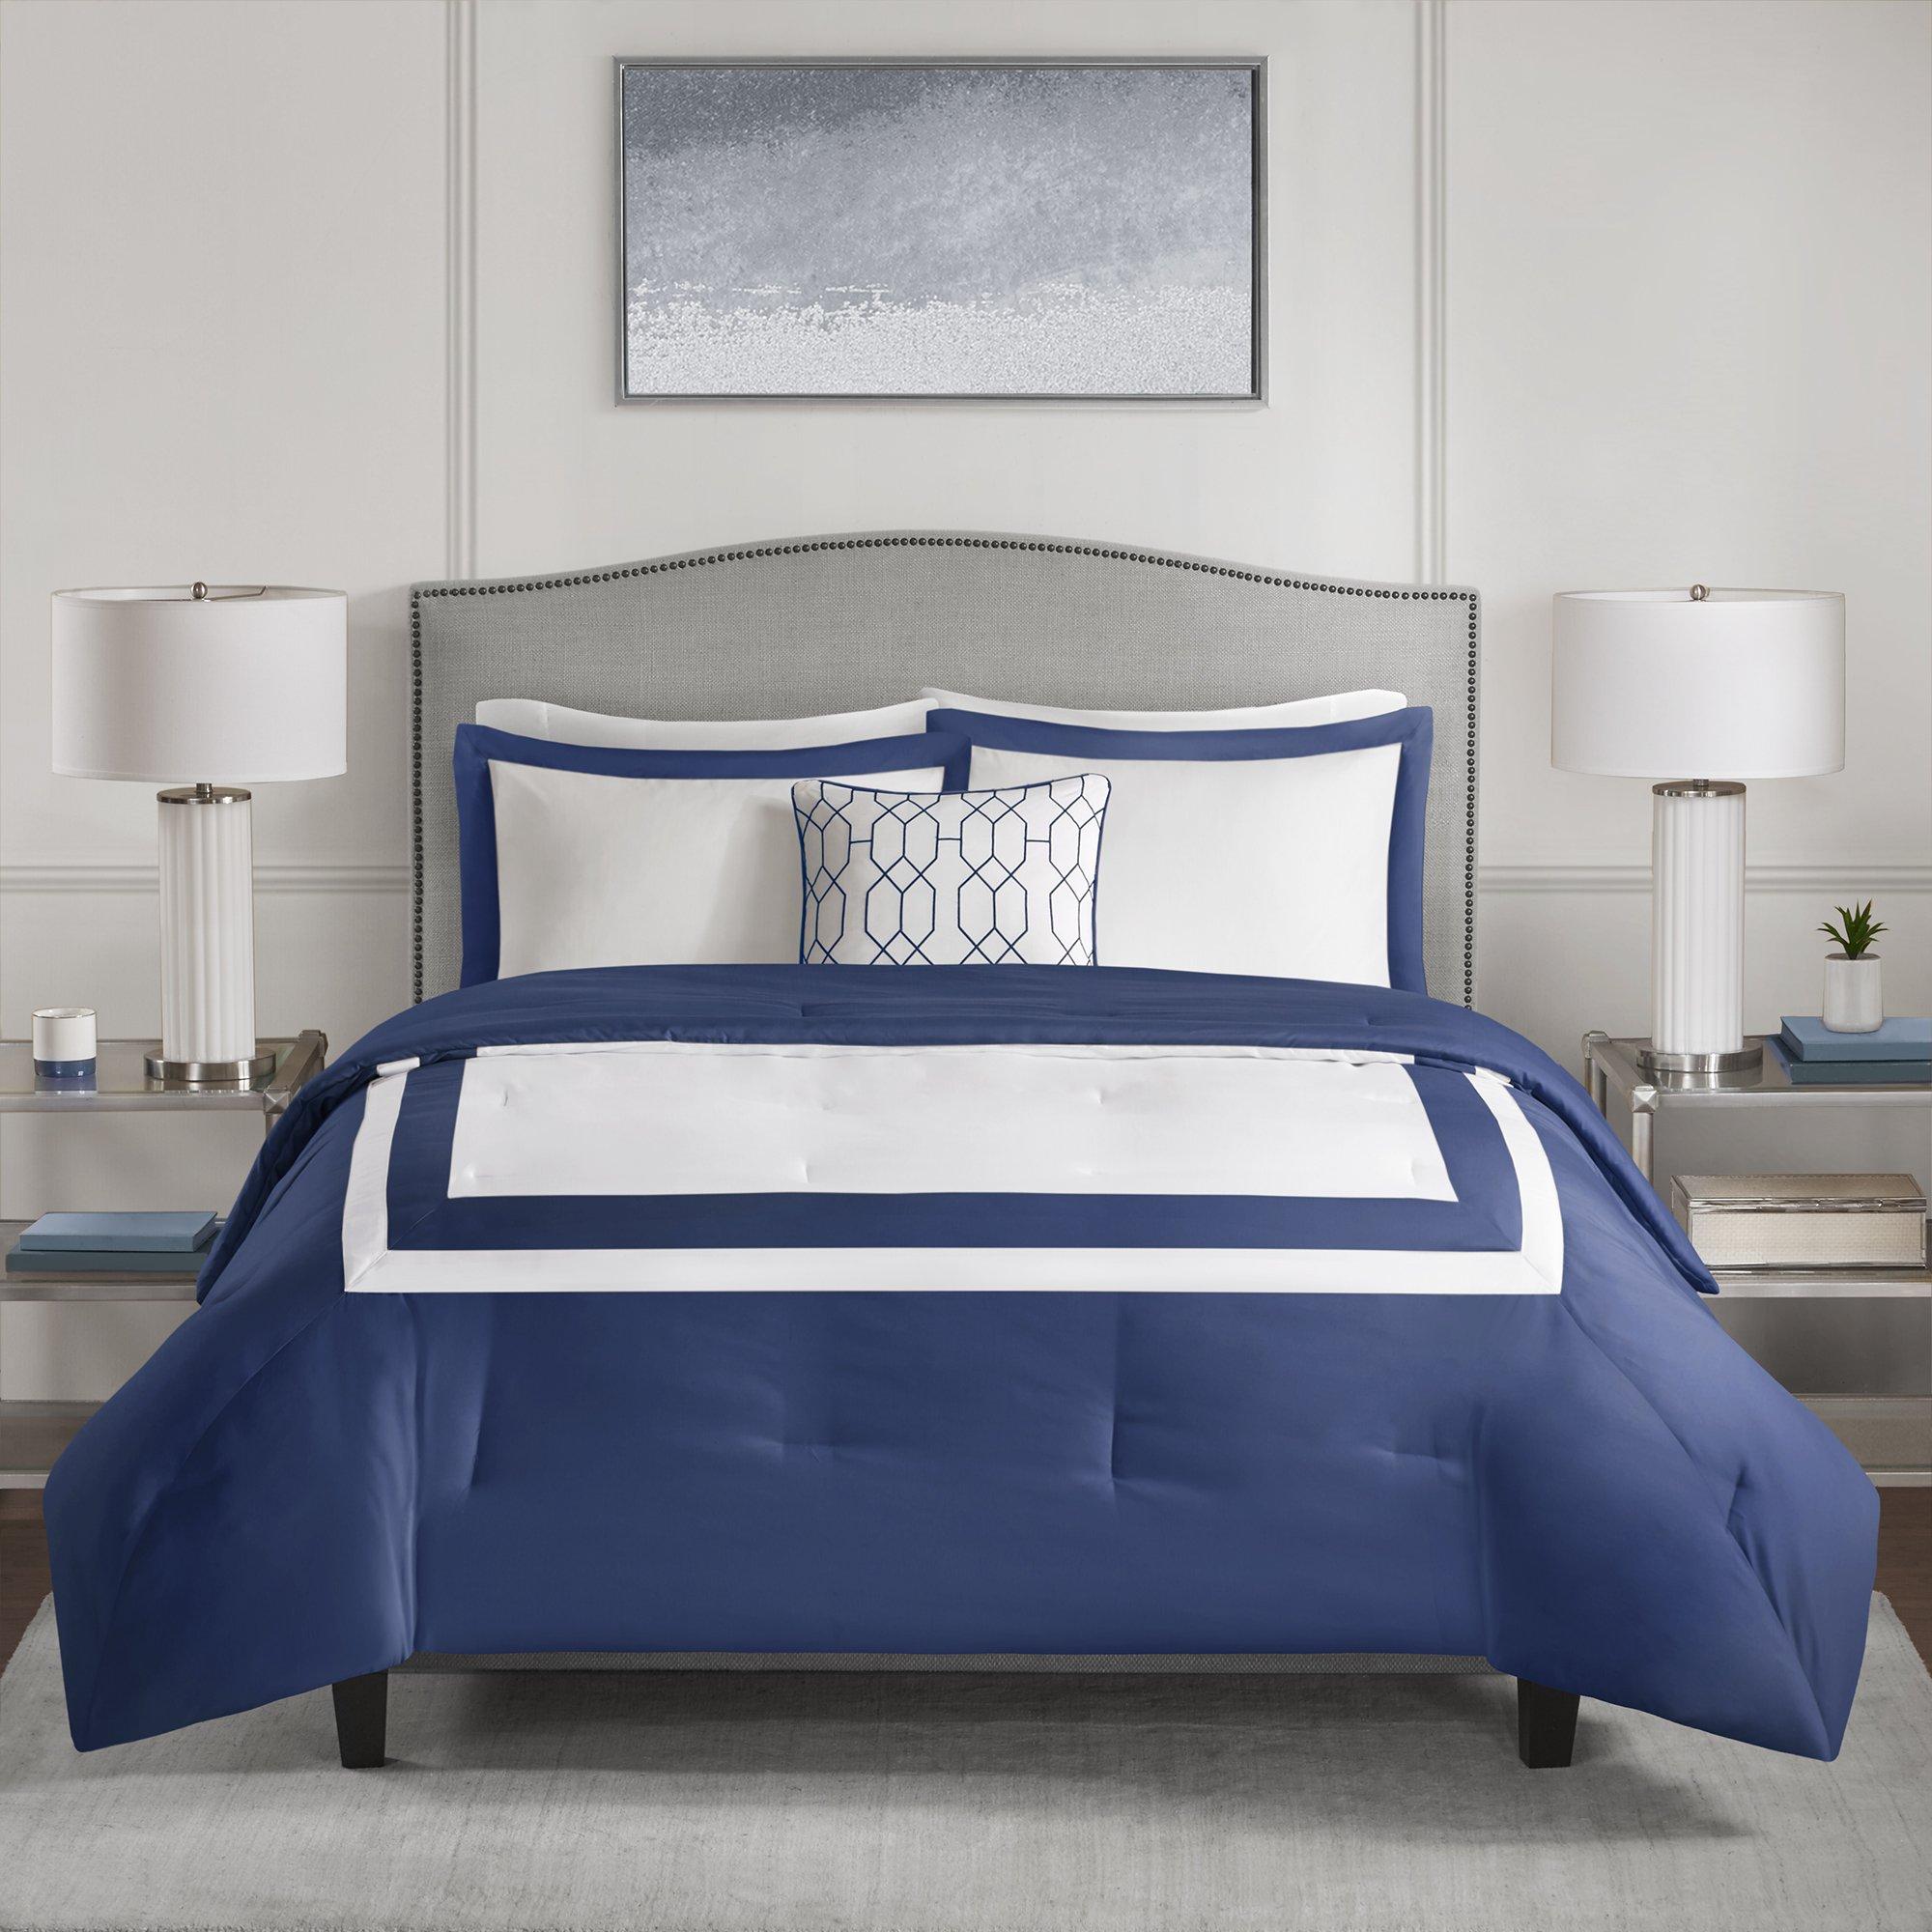 510 Design Hanson Navy (Blue) 4piece Comforter Set (King